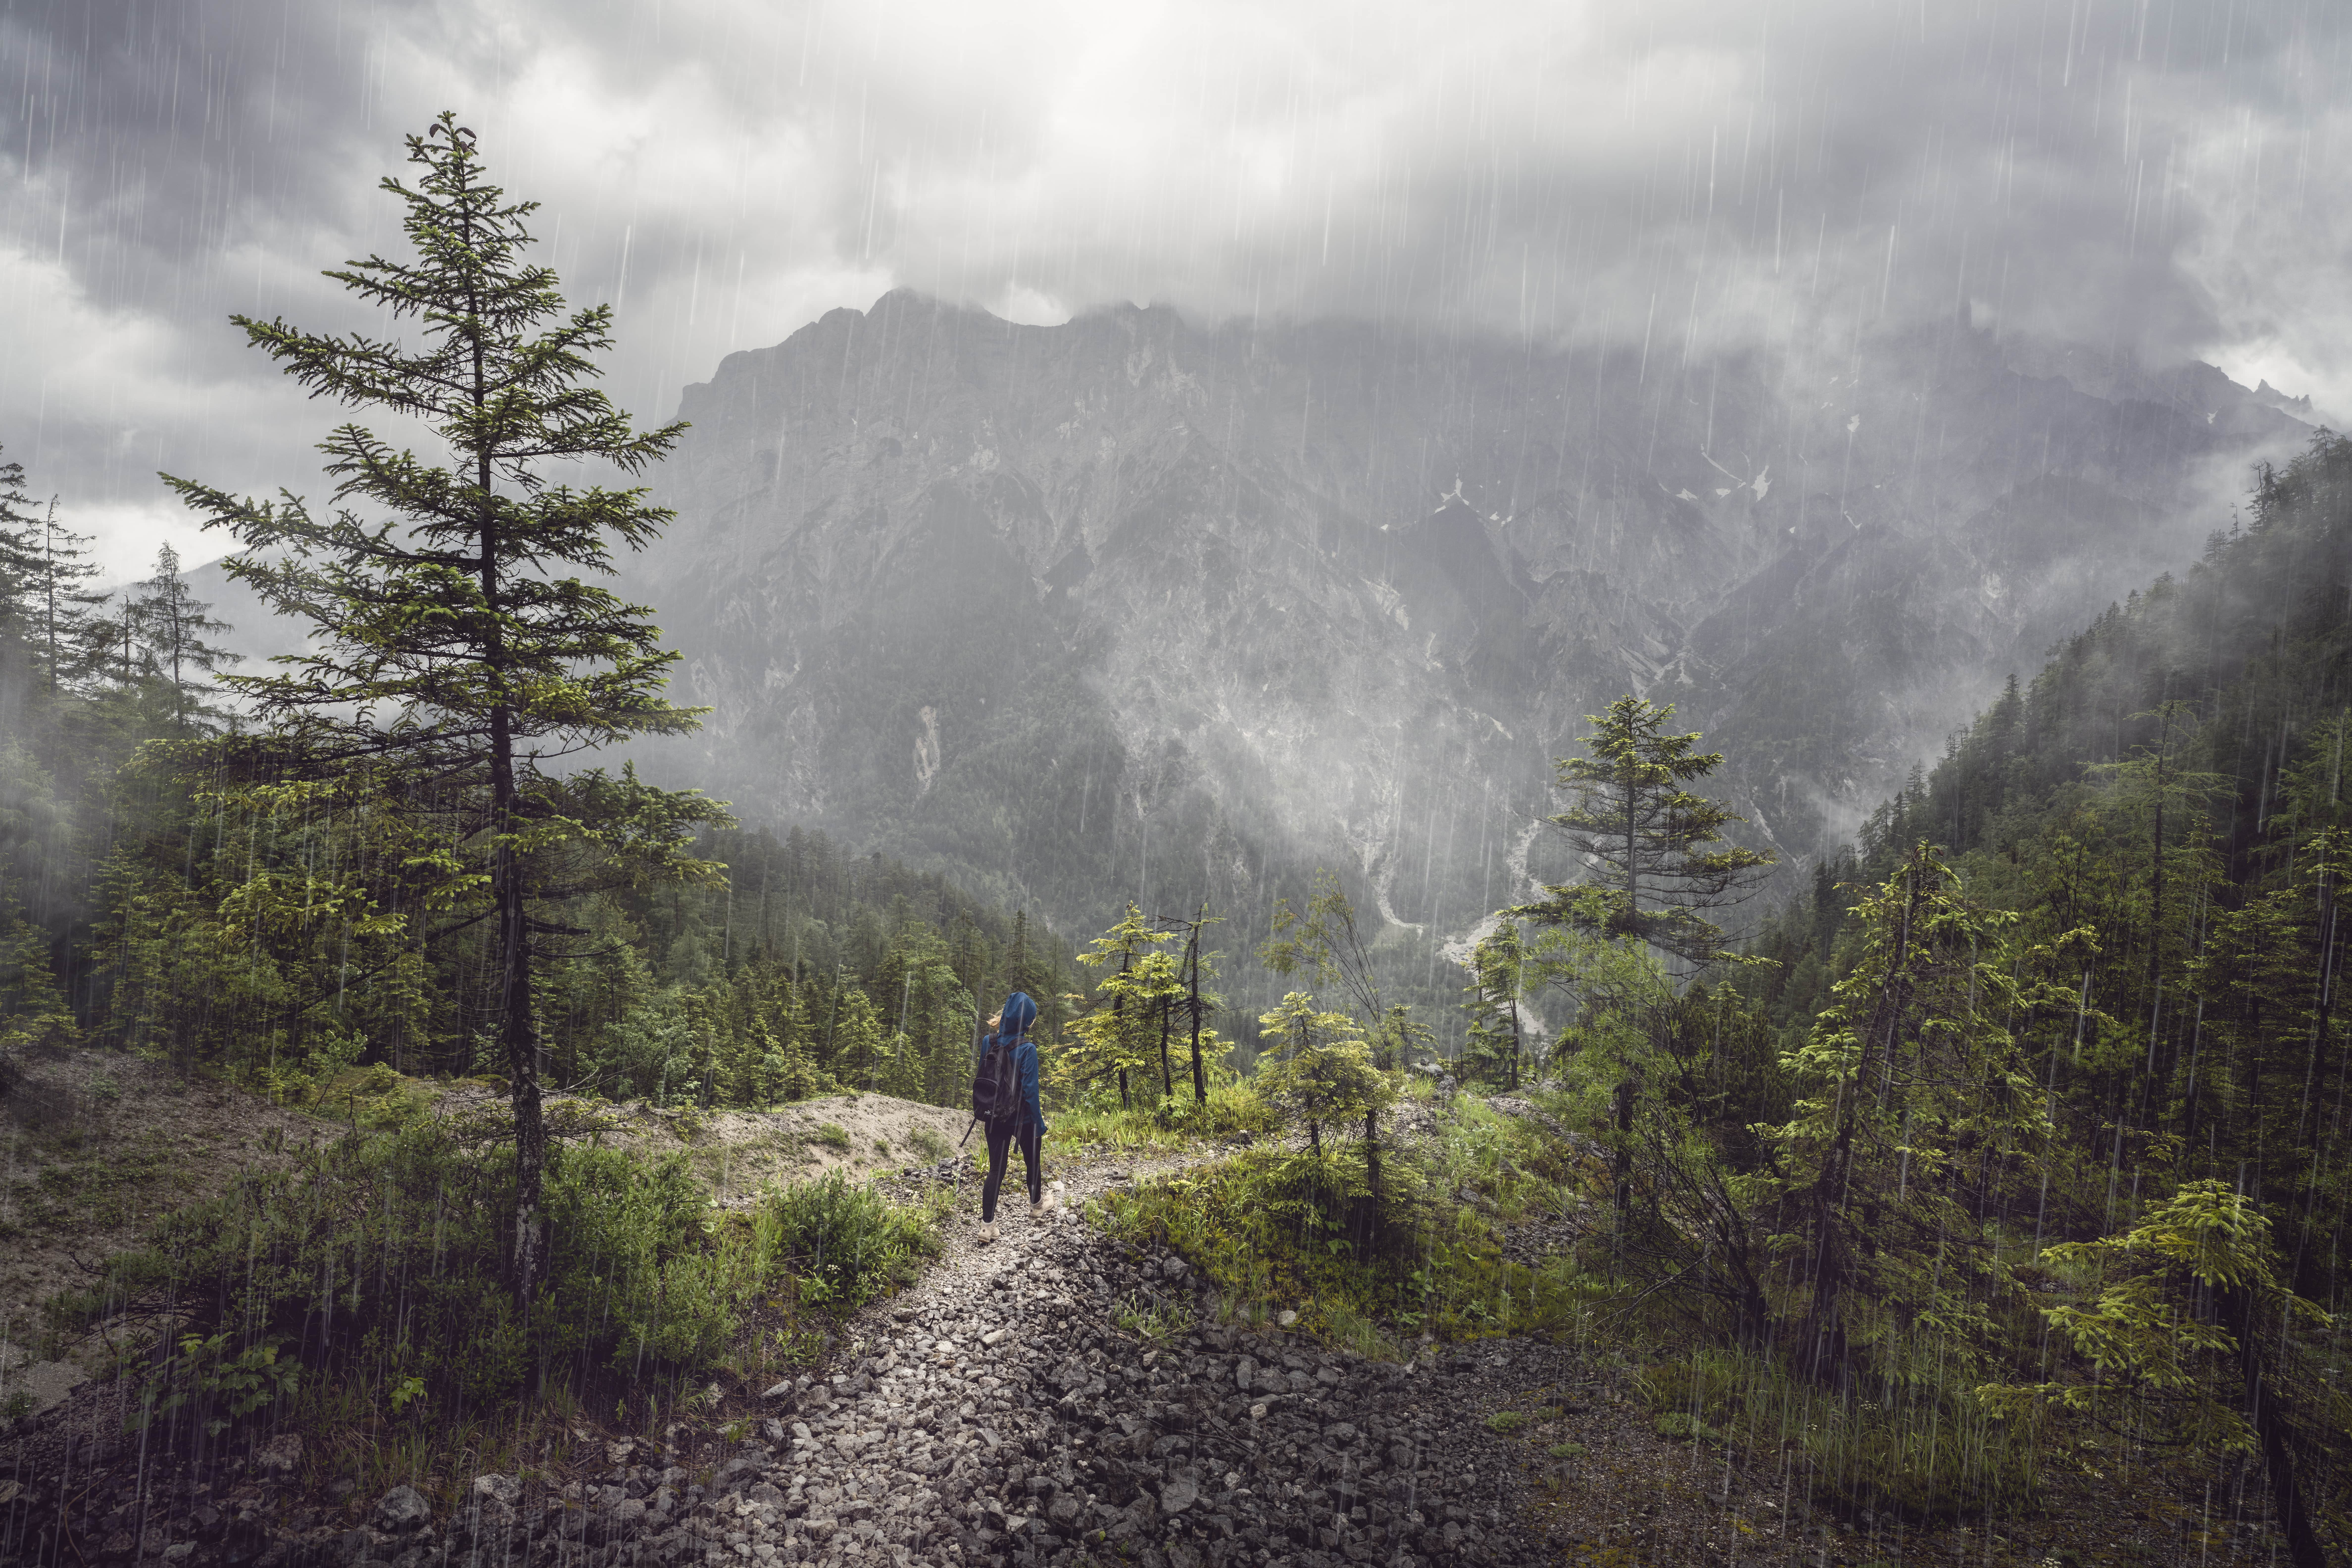 Hauptbild 006_Nationalparks_Austria_Gesäuse©Stefan_Leitner-min